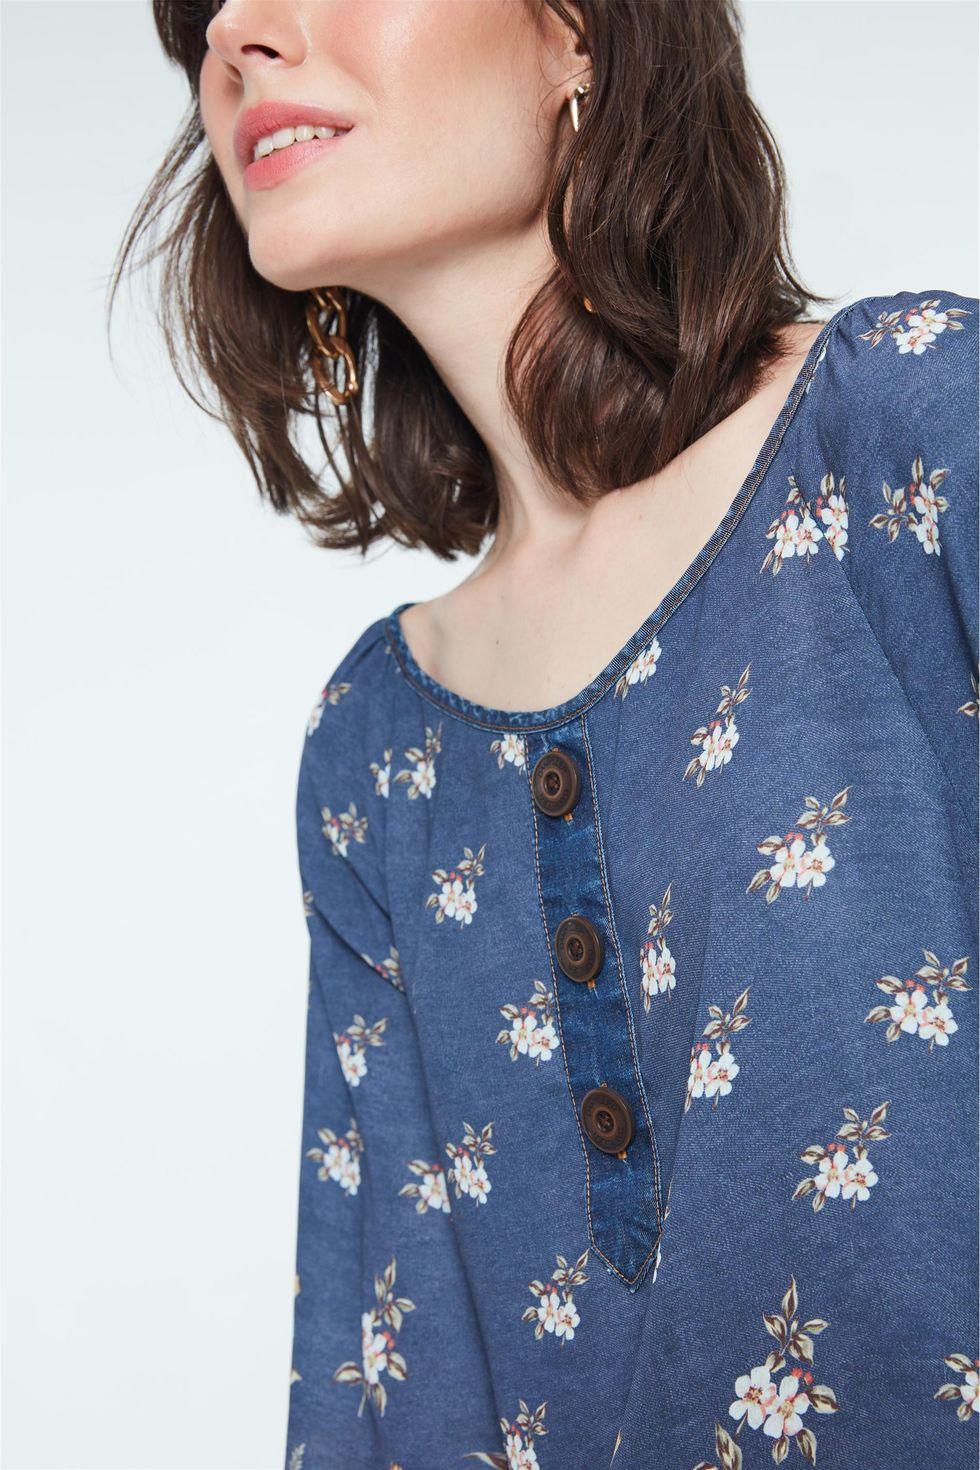 Blusa-Jeans-com-Estampa-Floral-Frente--